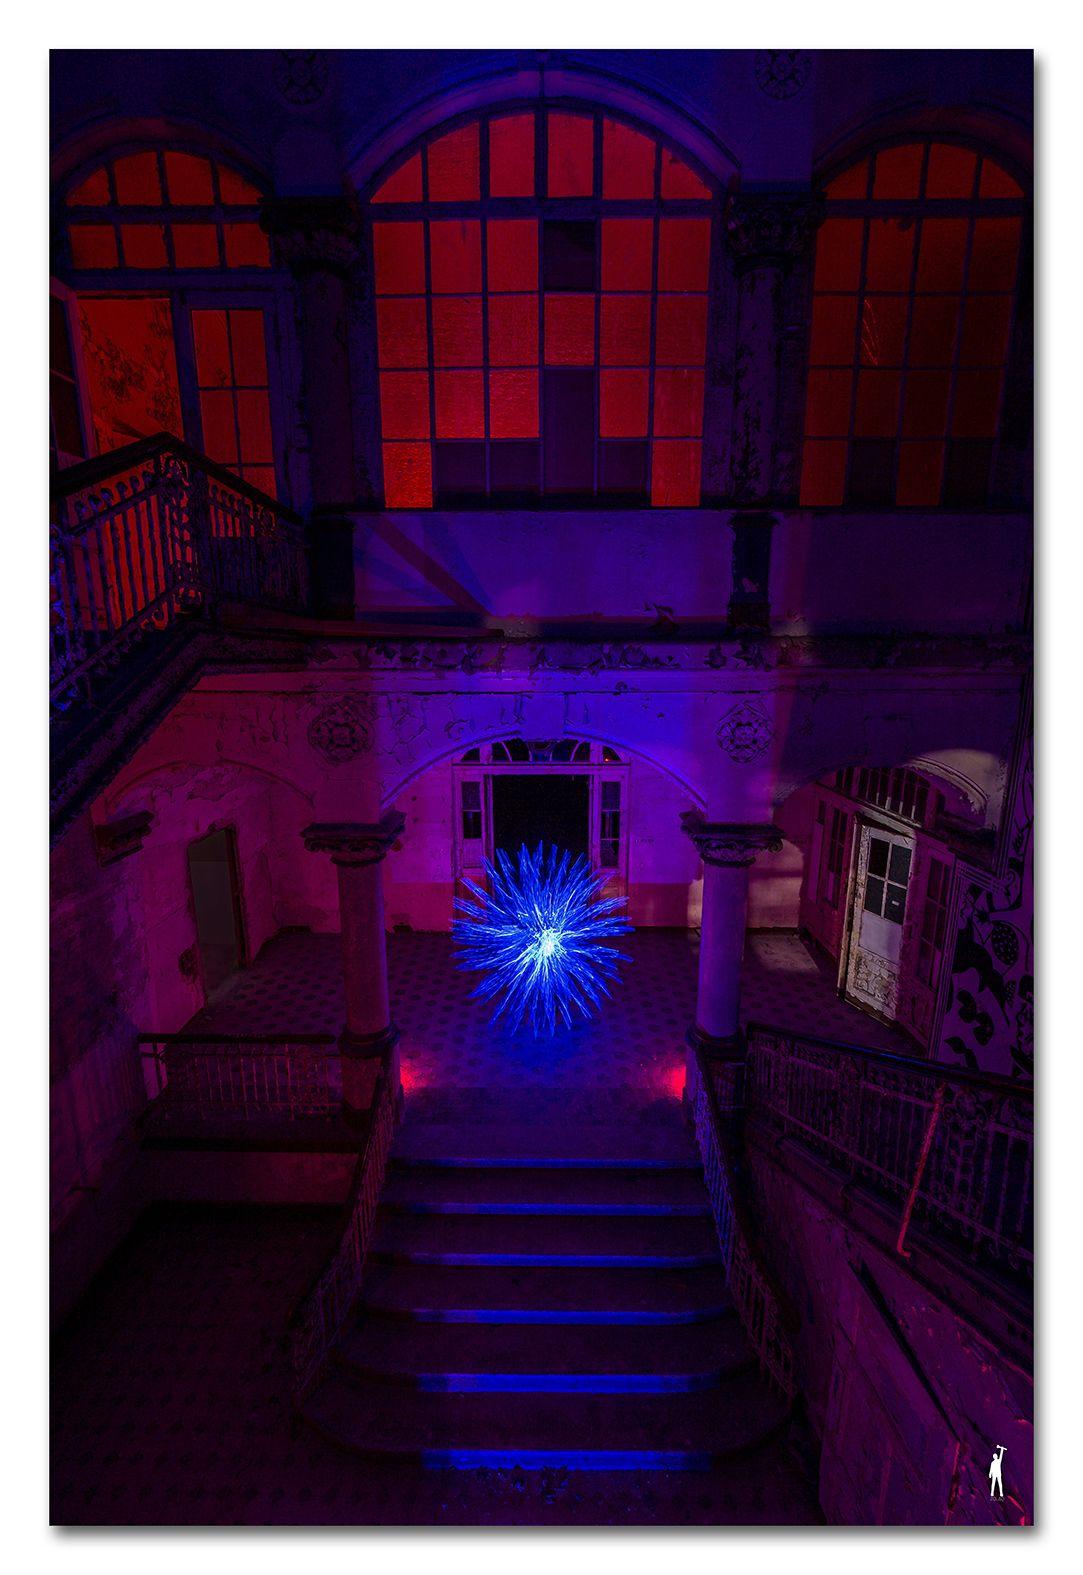 Zolaq Blue Crystal Blaue Kristalle Lichtkunstler Beelitz